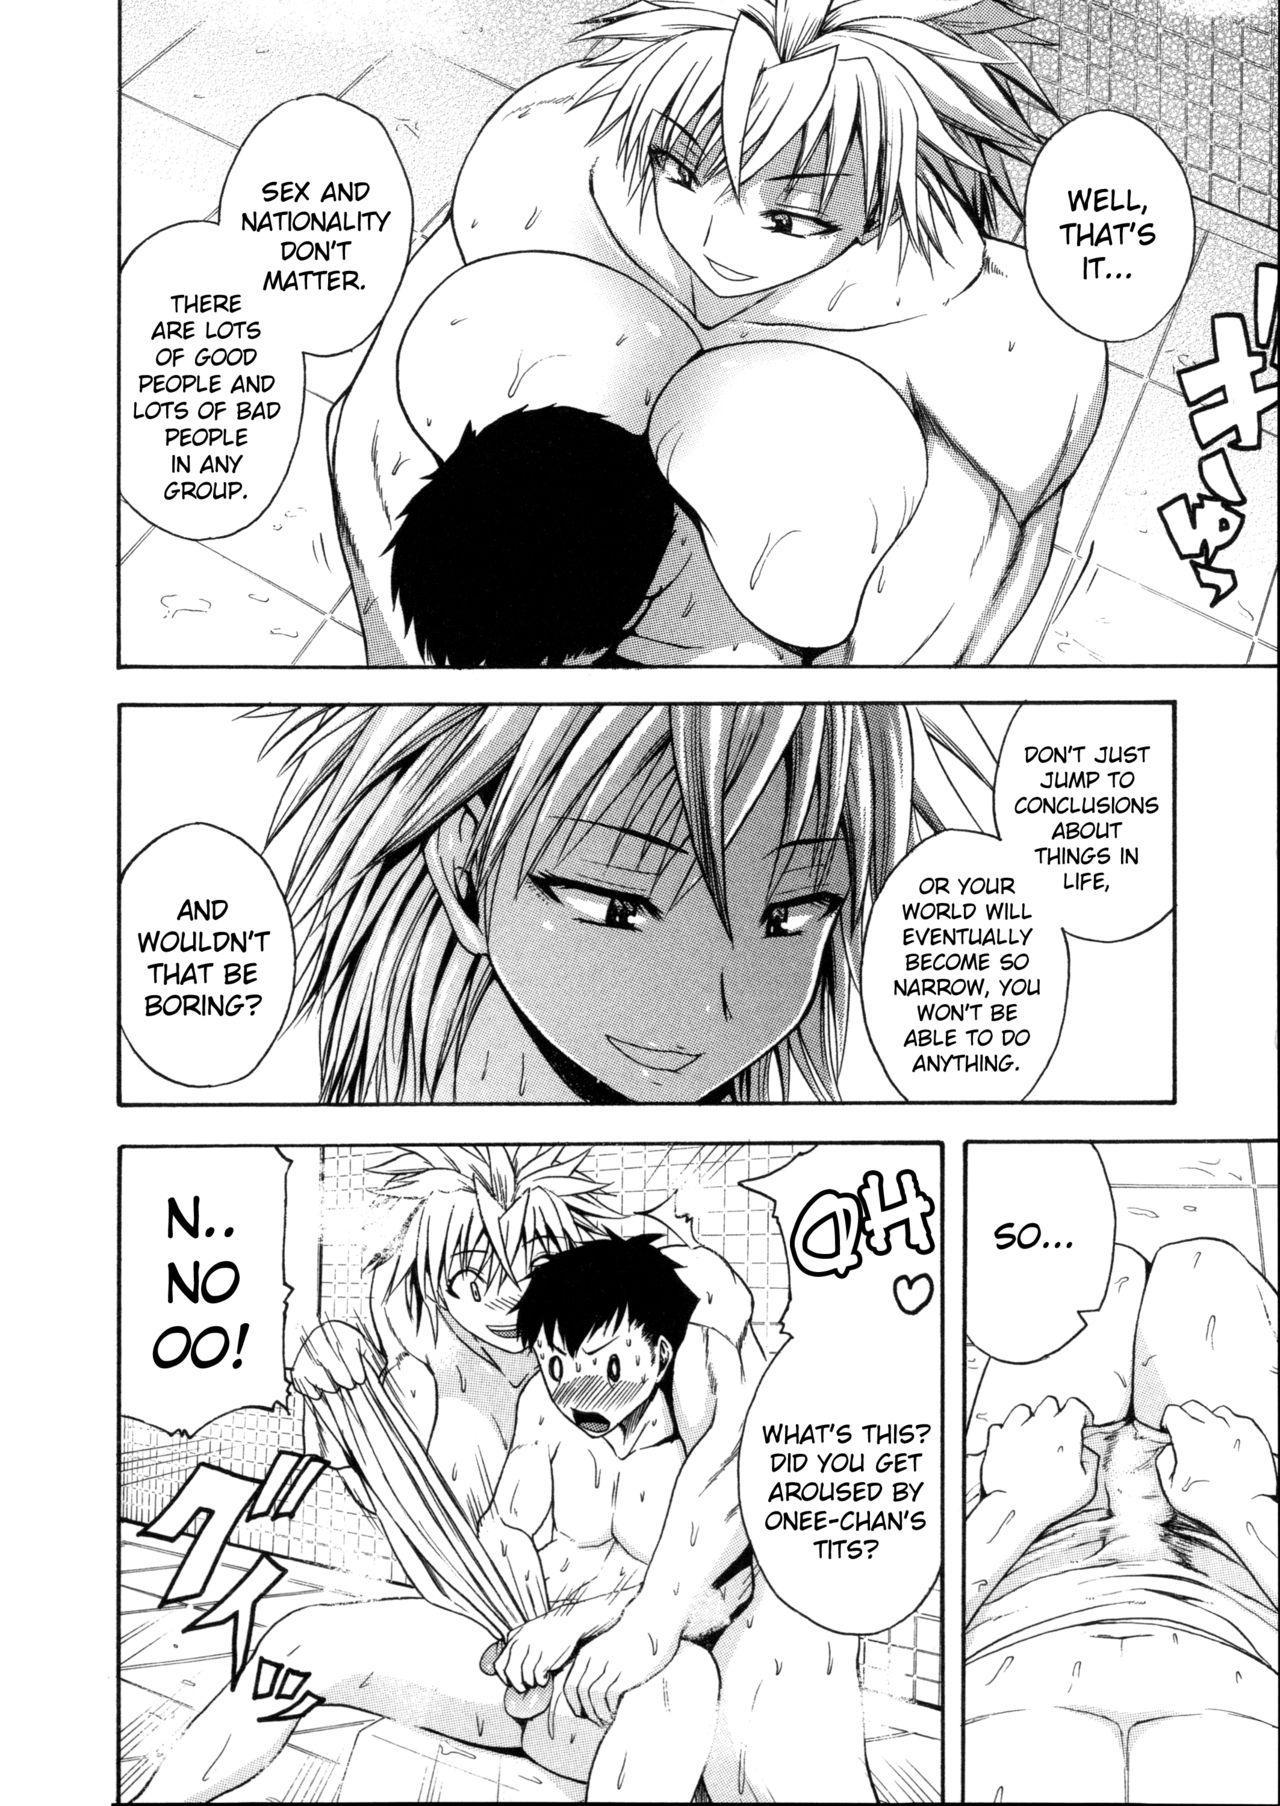 [Yoshimura Tatsumaki] Monzetsu Taigatame ~Count 3 de Ikasete Ageru~ | Faint in Agony Bodylock ~I'll make you cum on the count of 3~ [English] [Brolen] 138